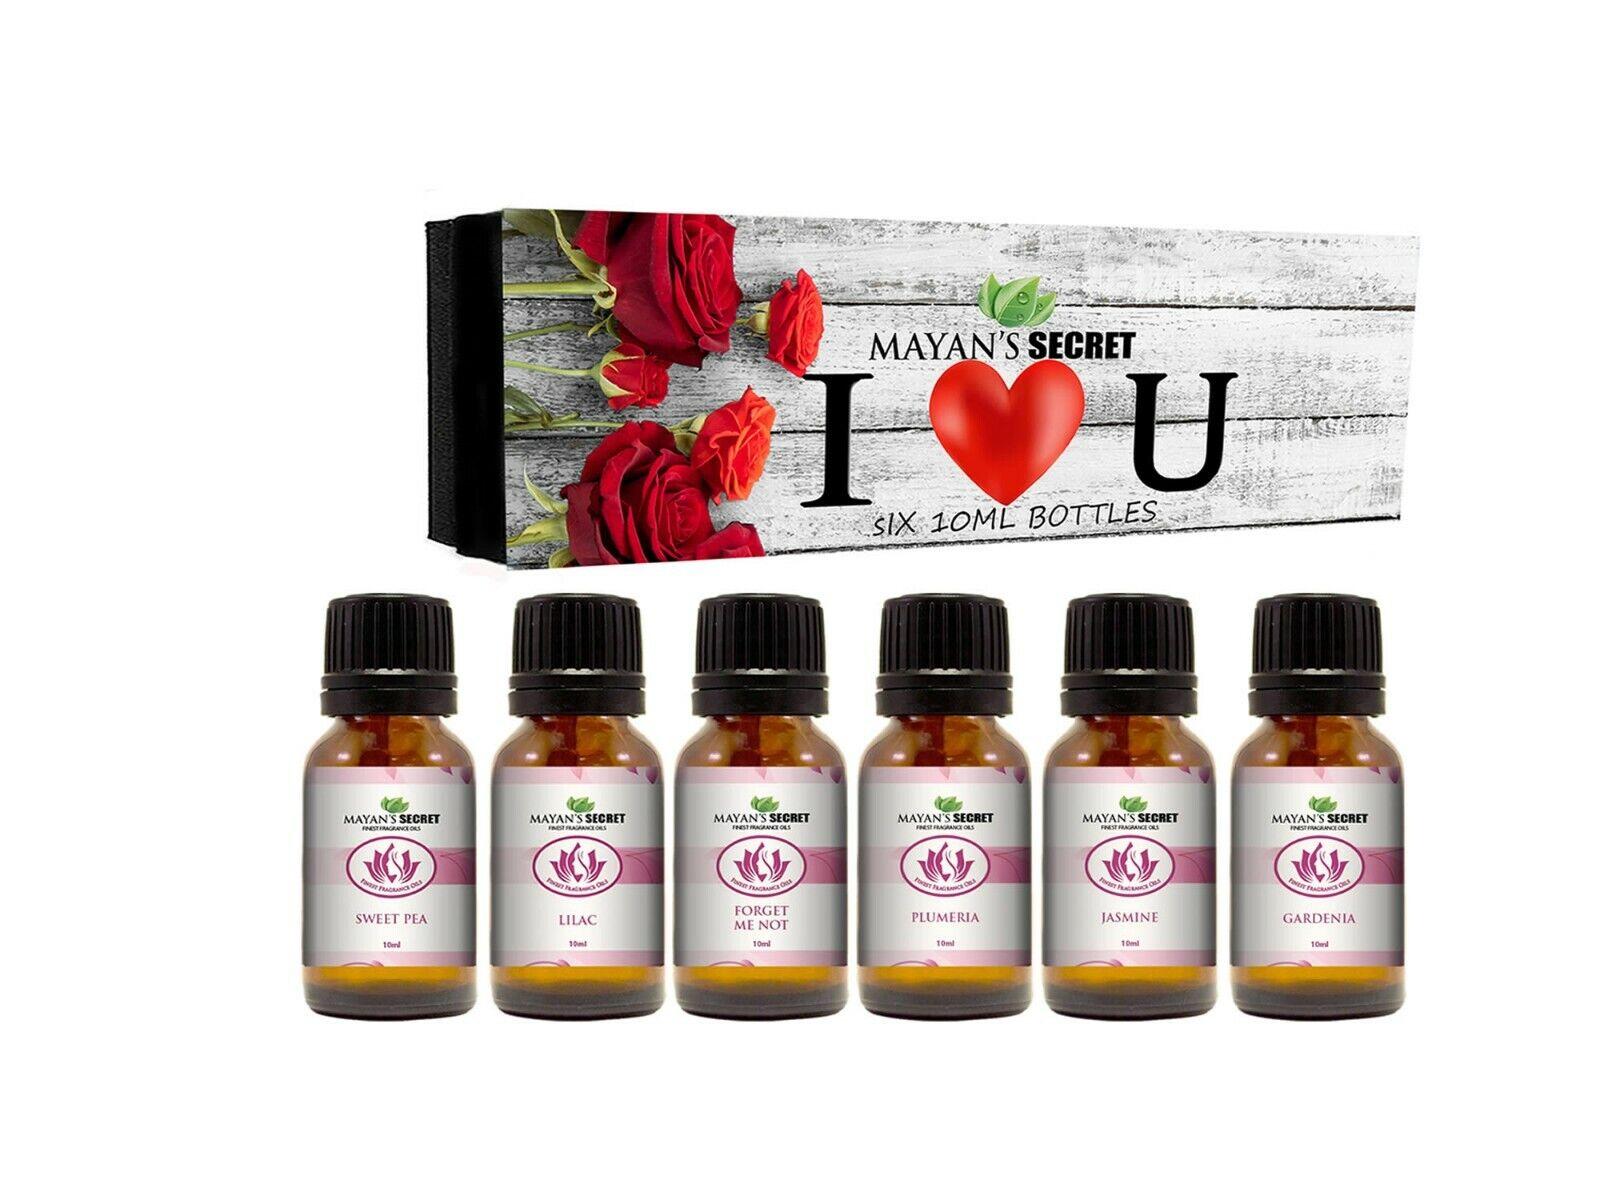 Premium Grade Fragrance Oil- I Love You – Gift Set 6/10ml,Forget me not, Plumeri Candle Making & Soap Making